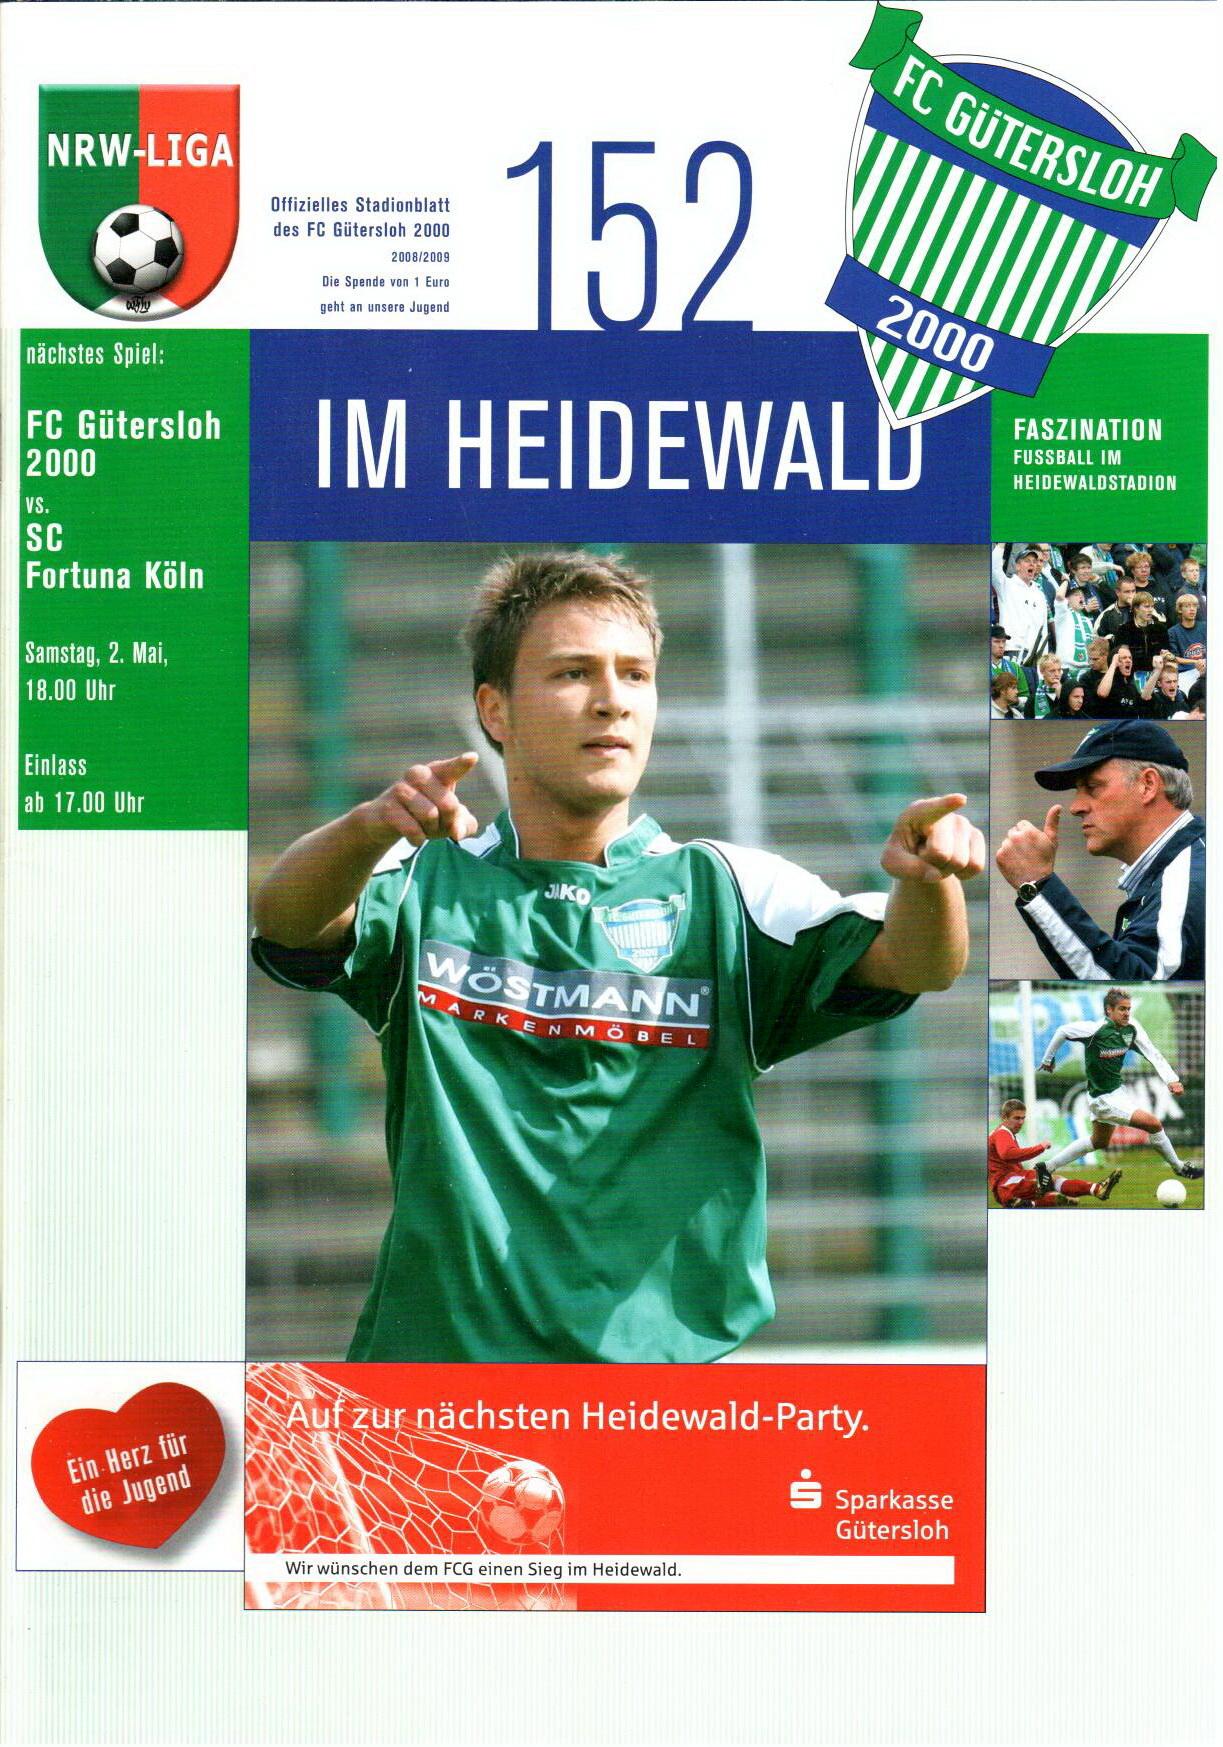 090502_Heft_FC_Gütersloh_Fortuna_Köln_Soke2